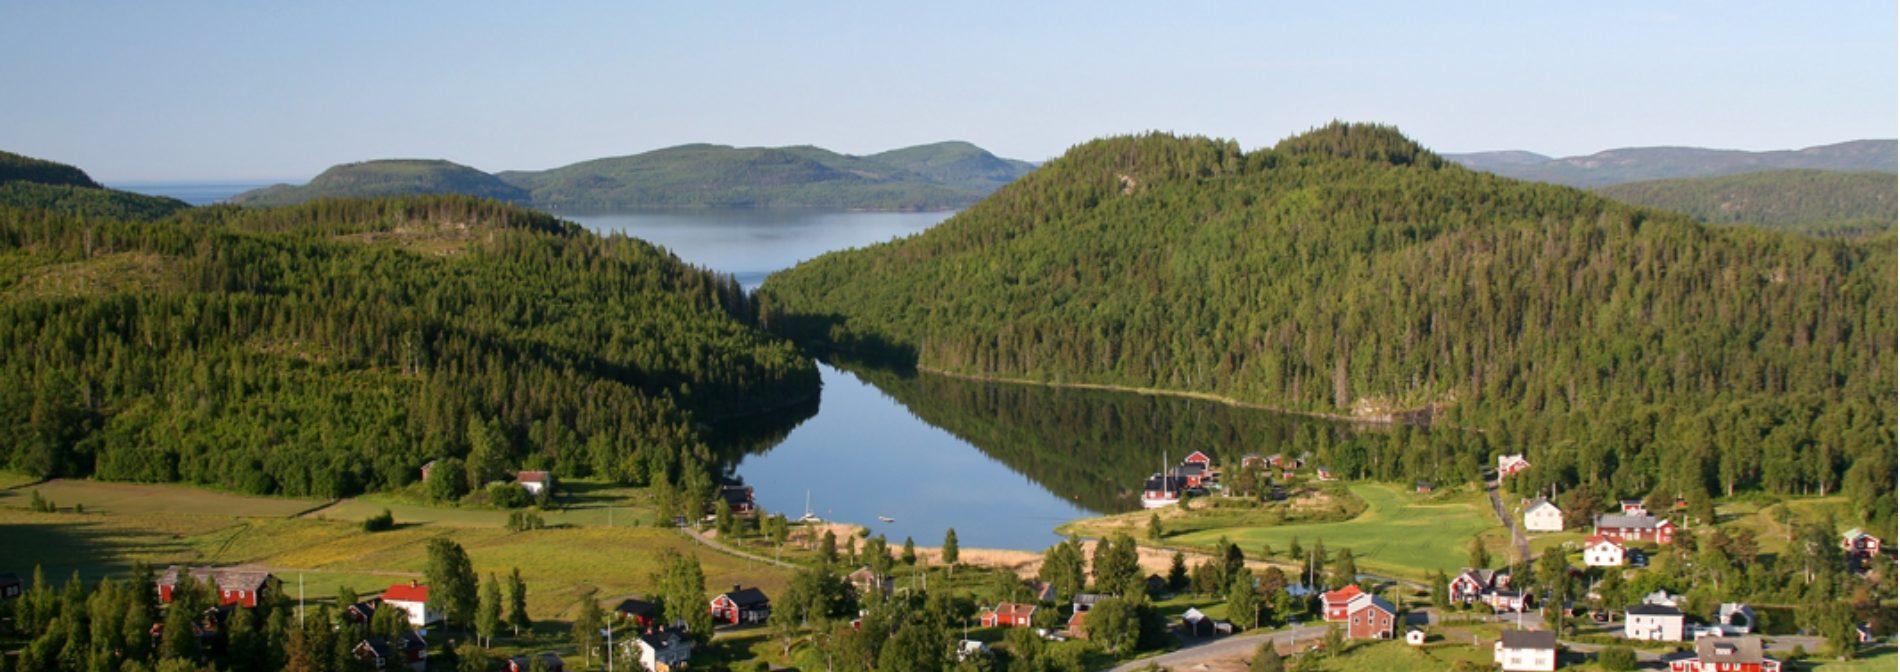 Swedenbybike höga kusten